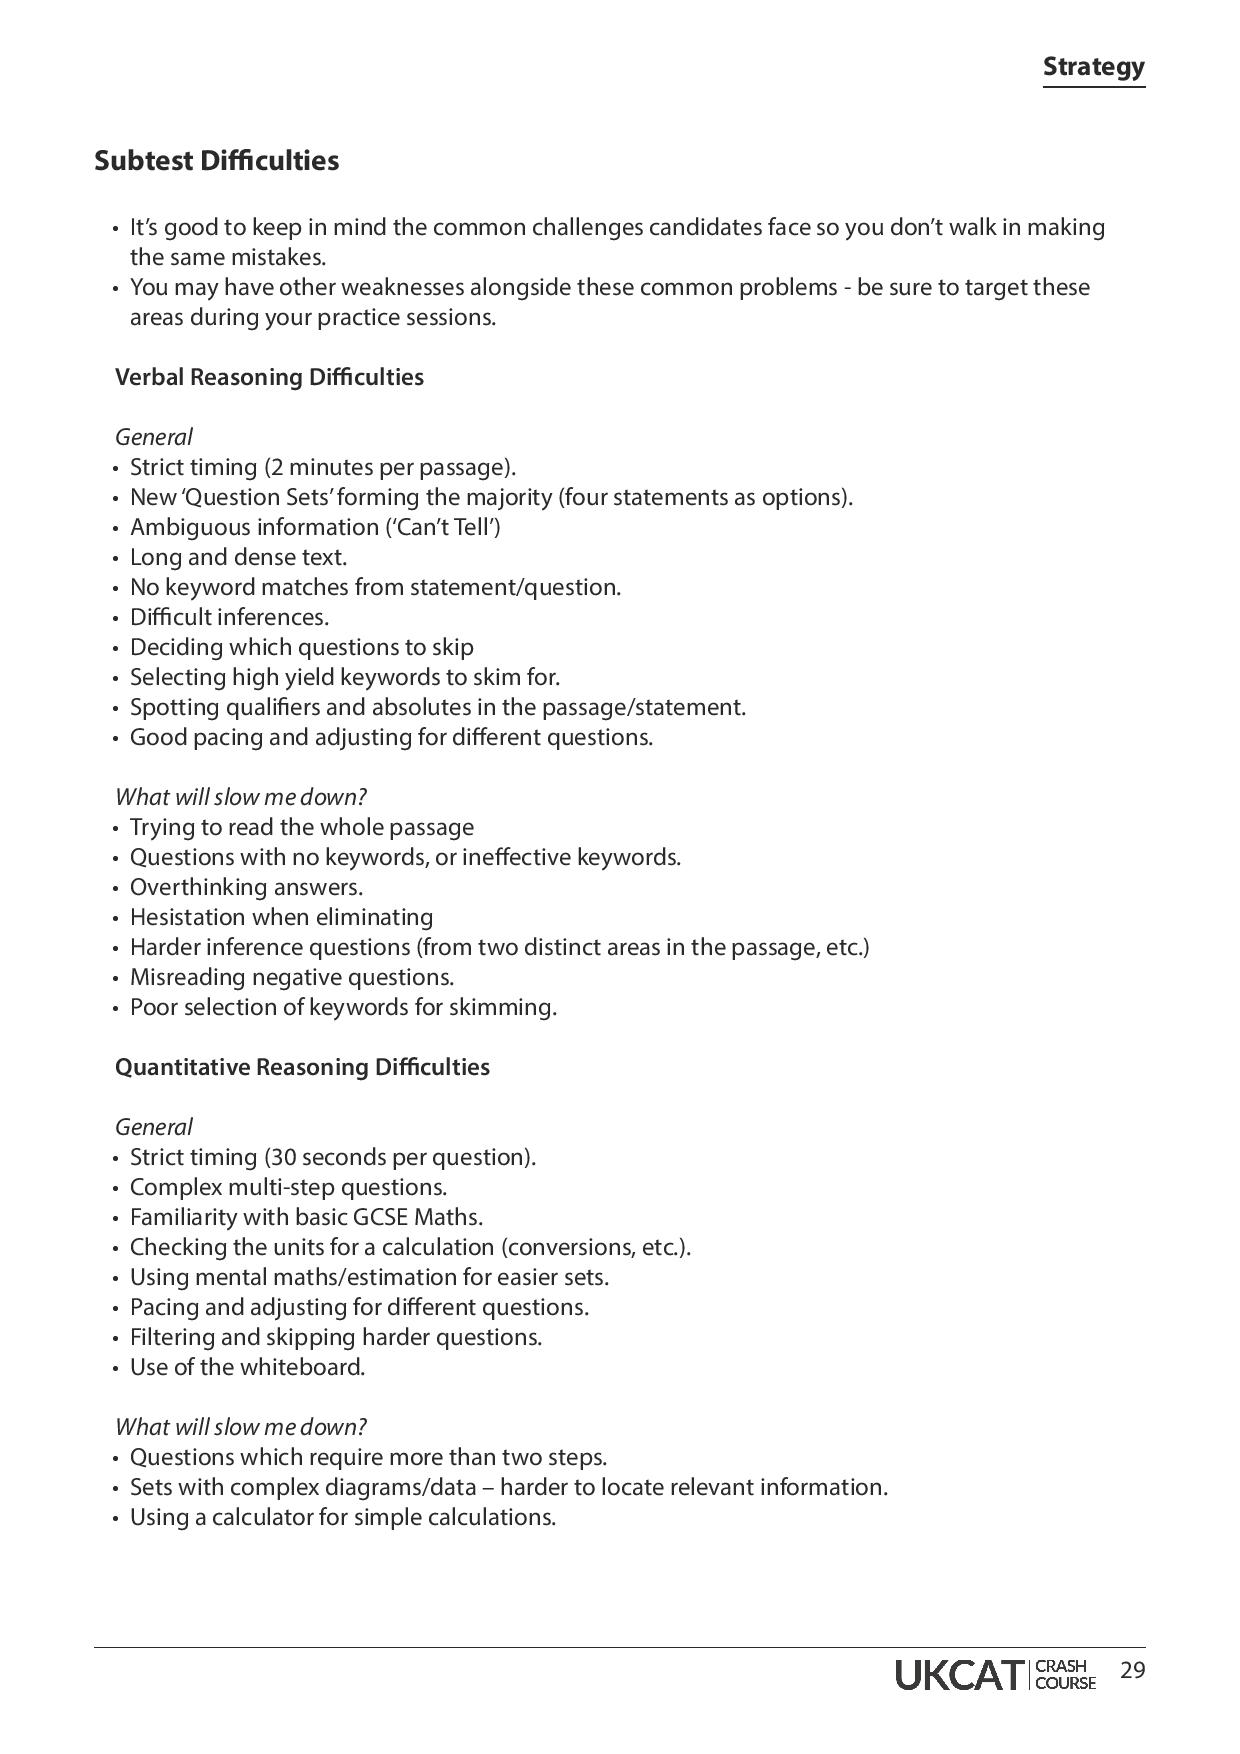 UKCAT Crash Course Handbook page 29